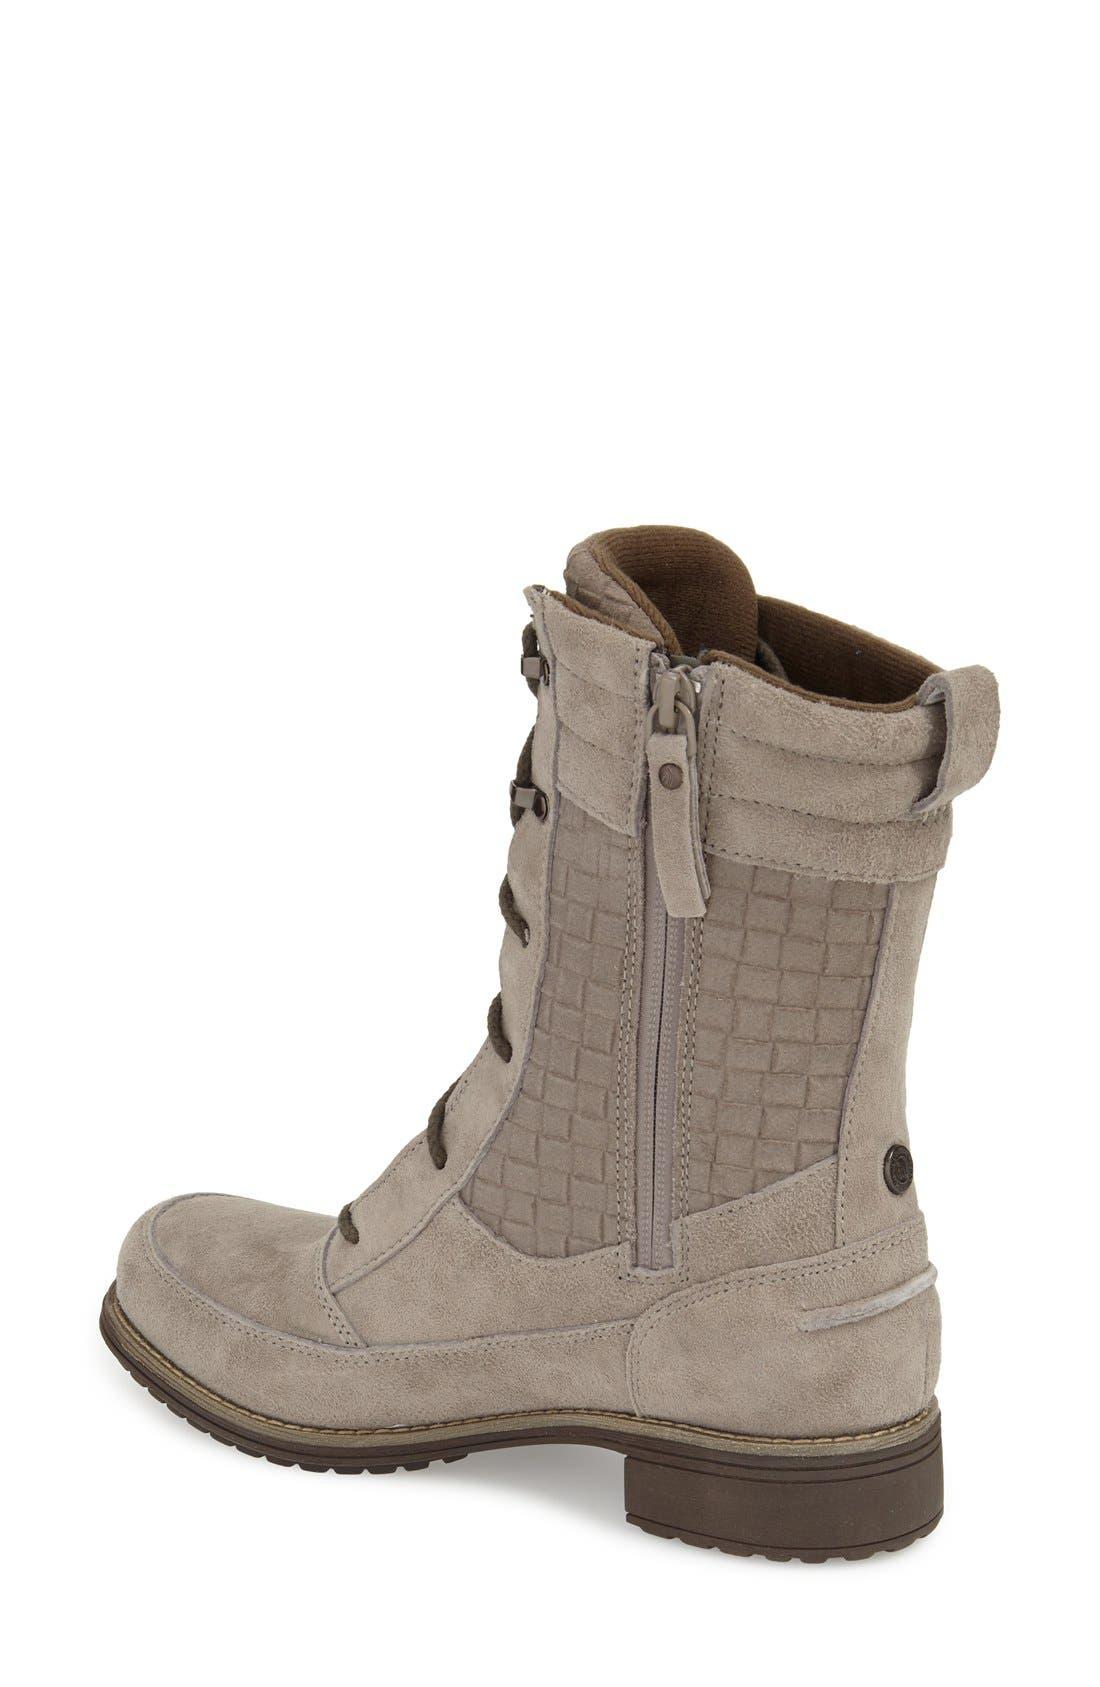 Alternate Image 2  - The North Face 'Bridgeton Lace' Waterproof Boot (Women)